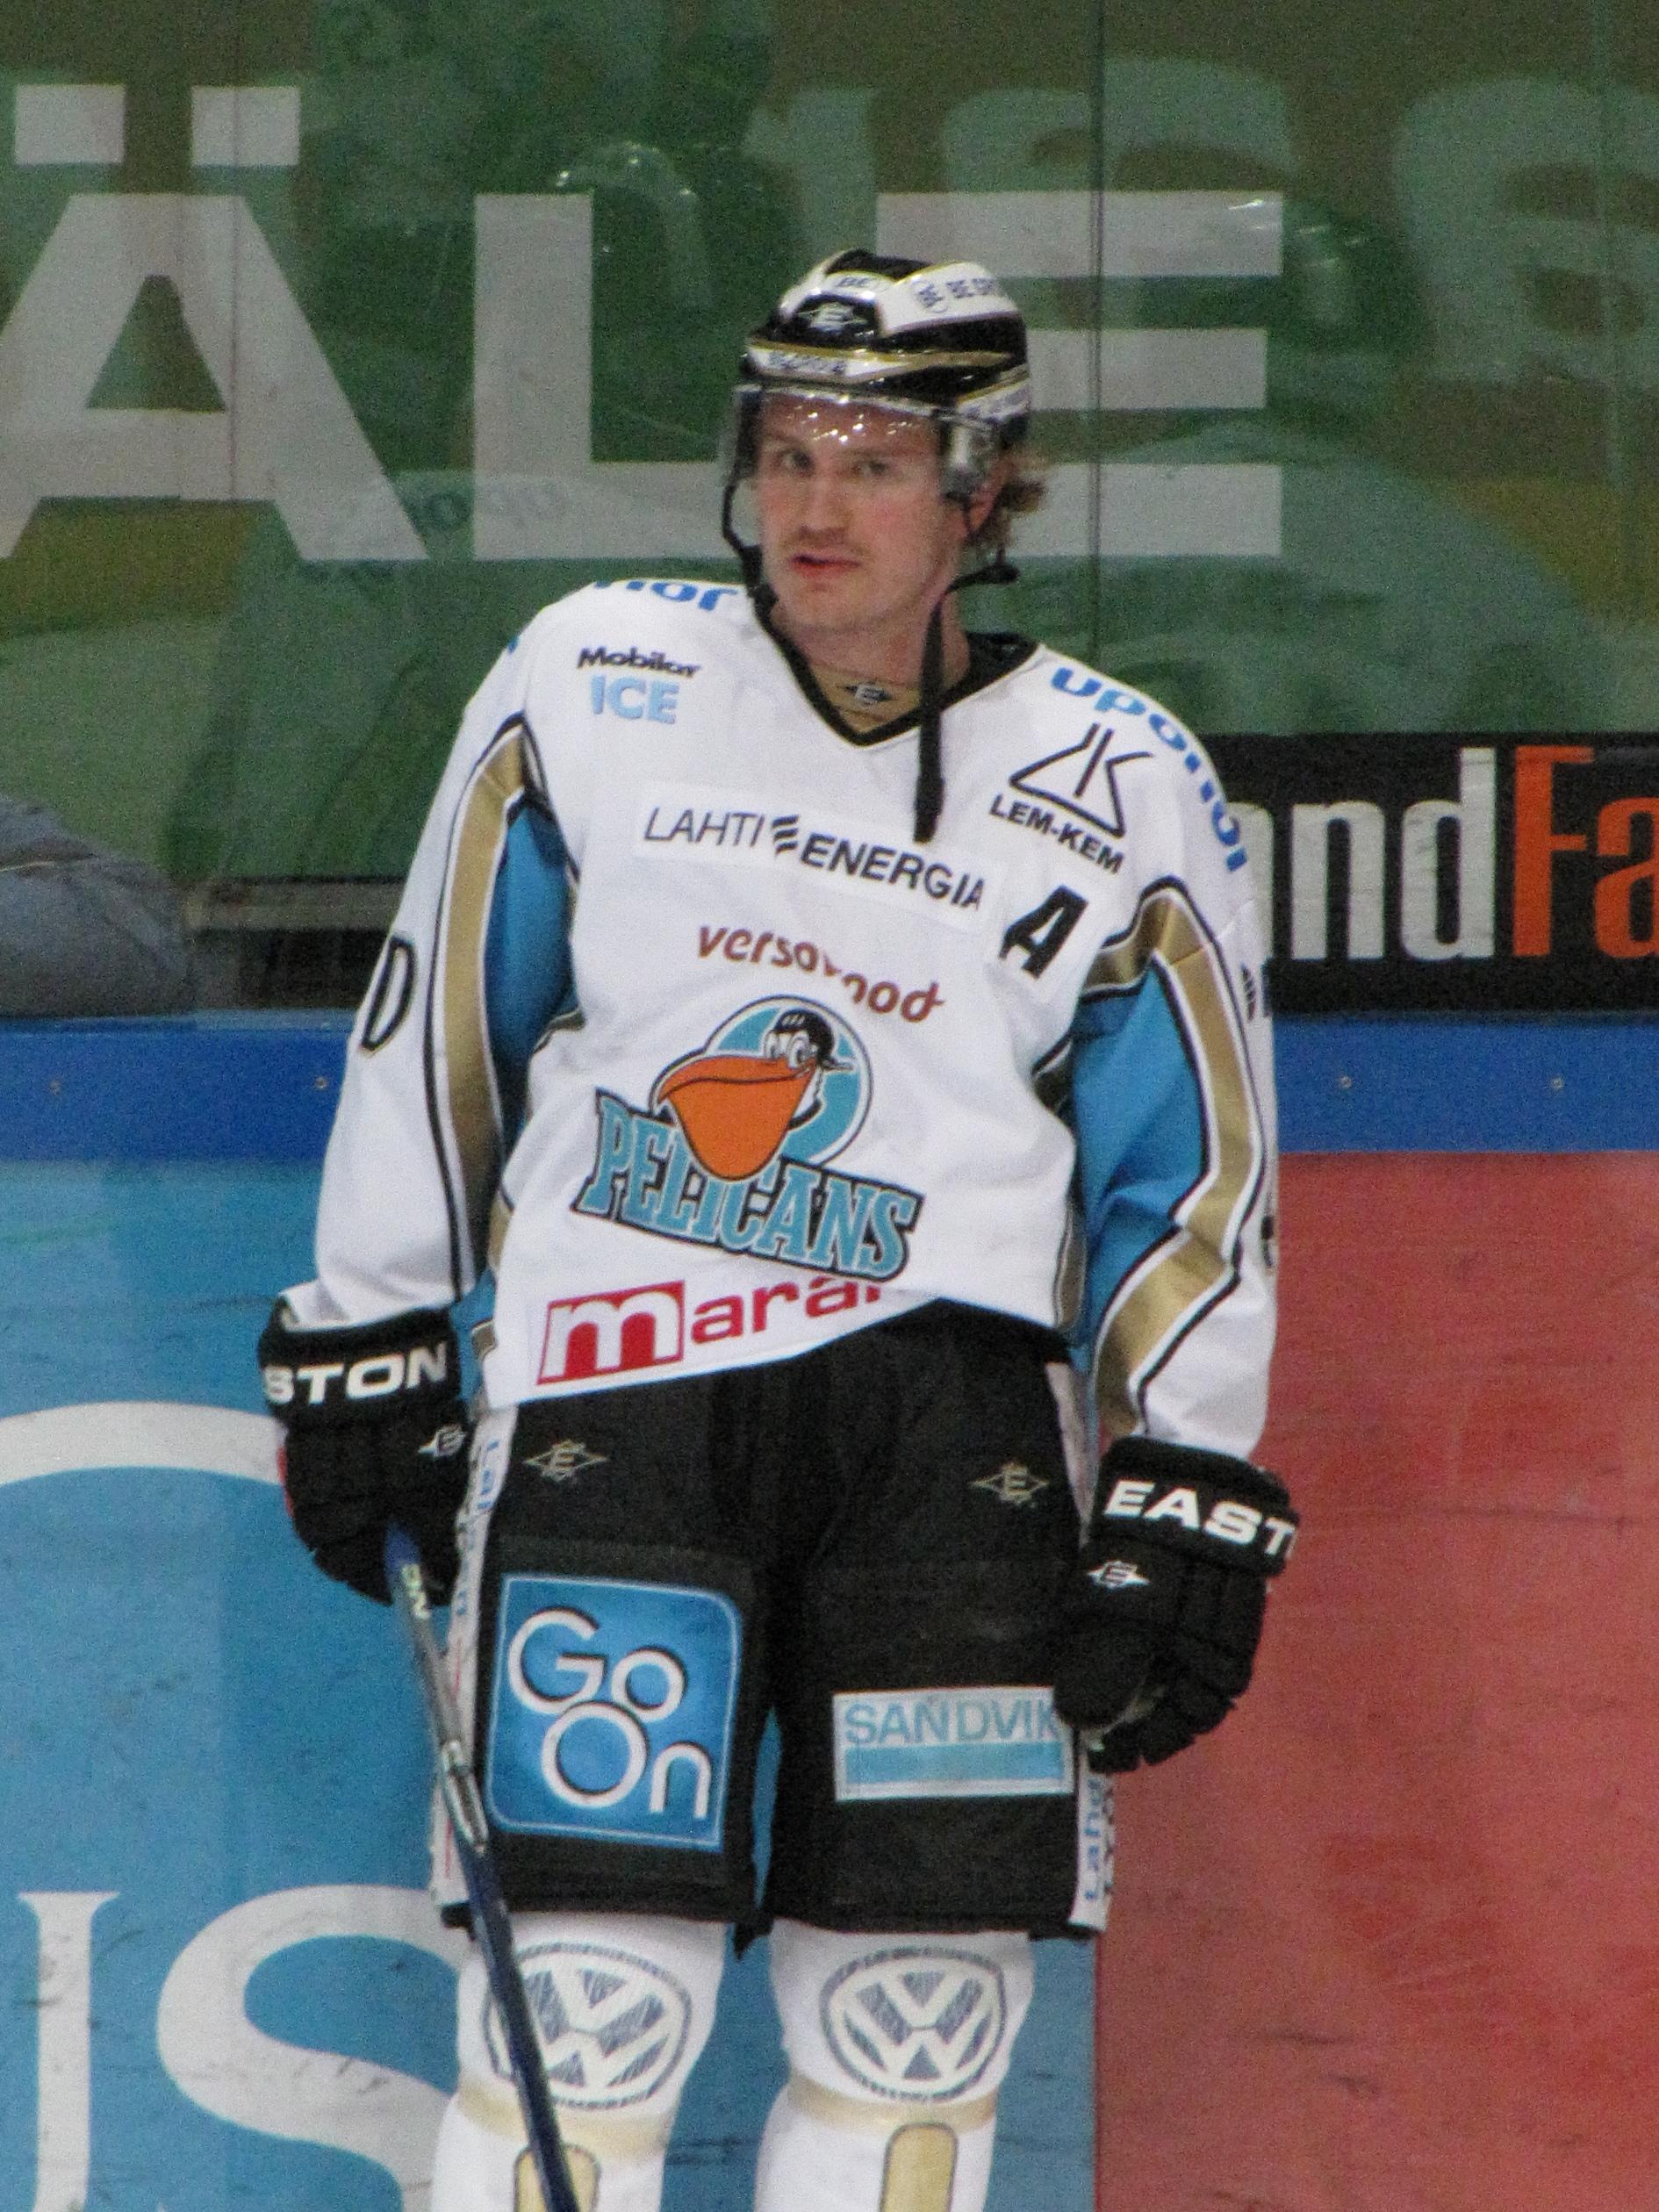 Brett Lievers